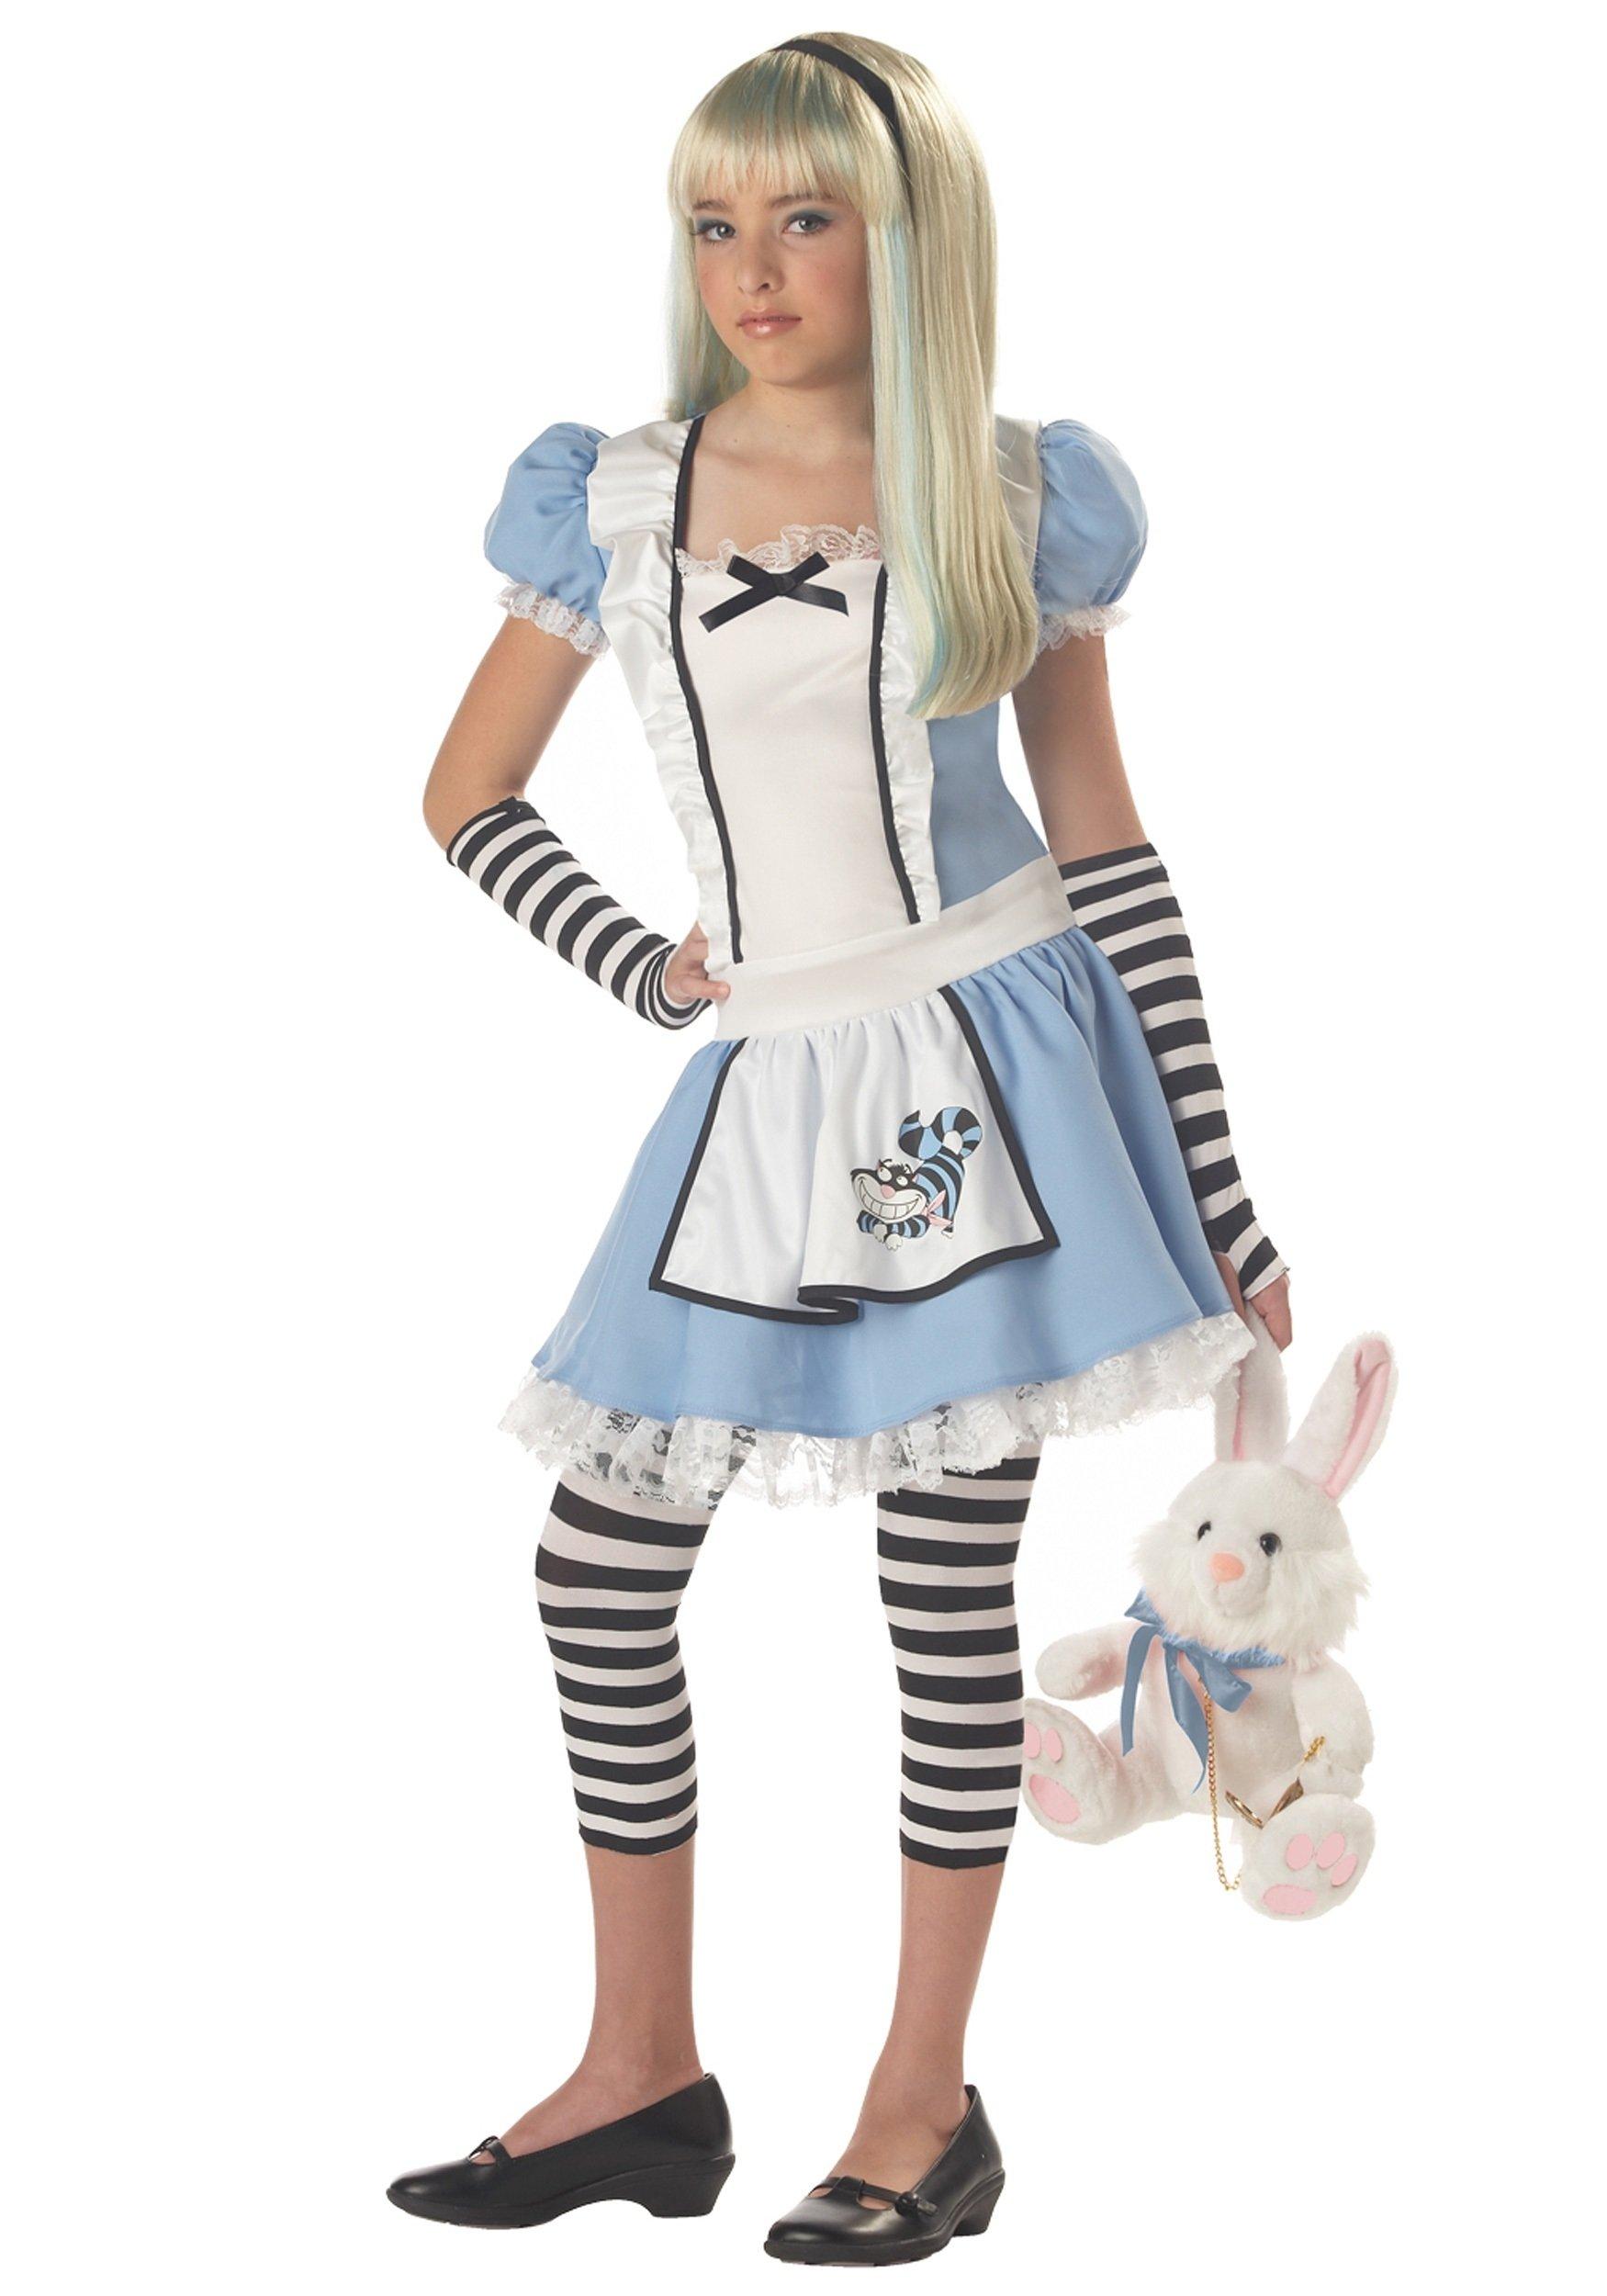 10 Famous Halloween Costume Ideas Teenage Girl tween alice costume 2020